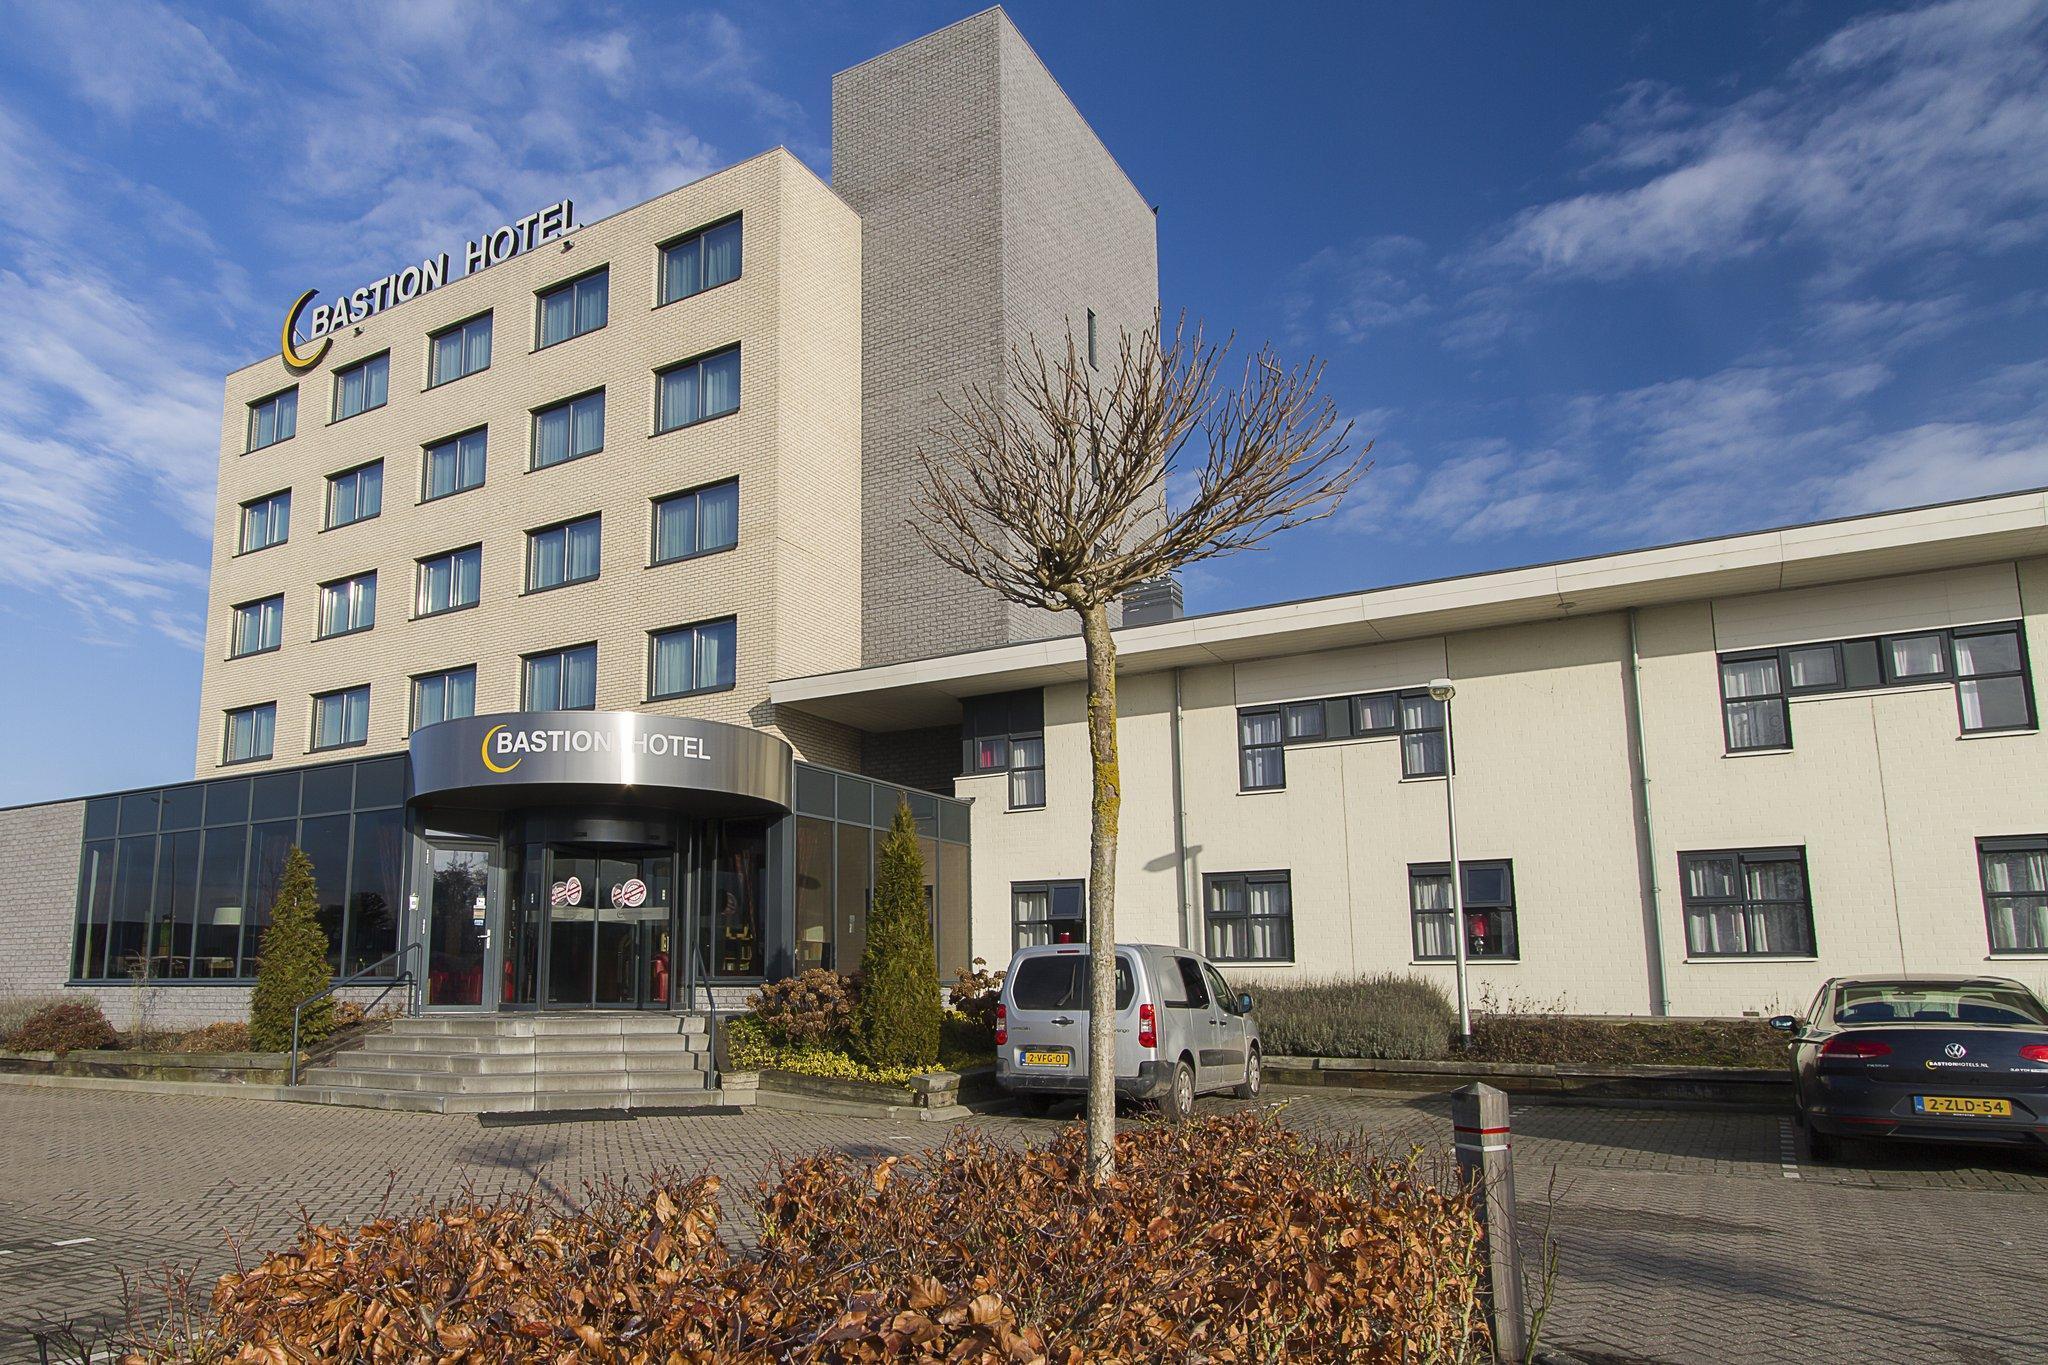 Bastion Hotel Groningen, Groningen